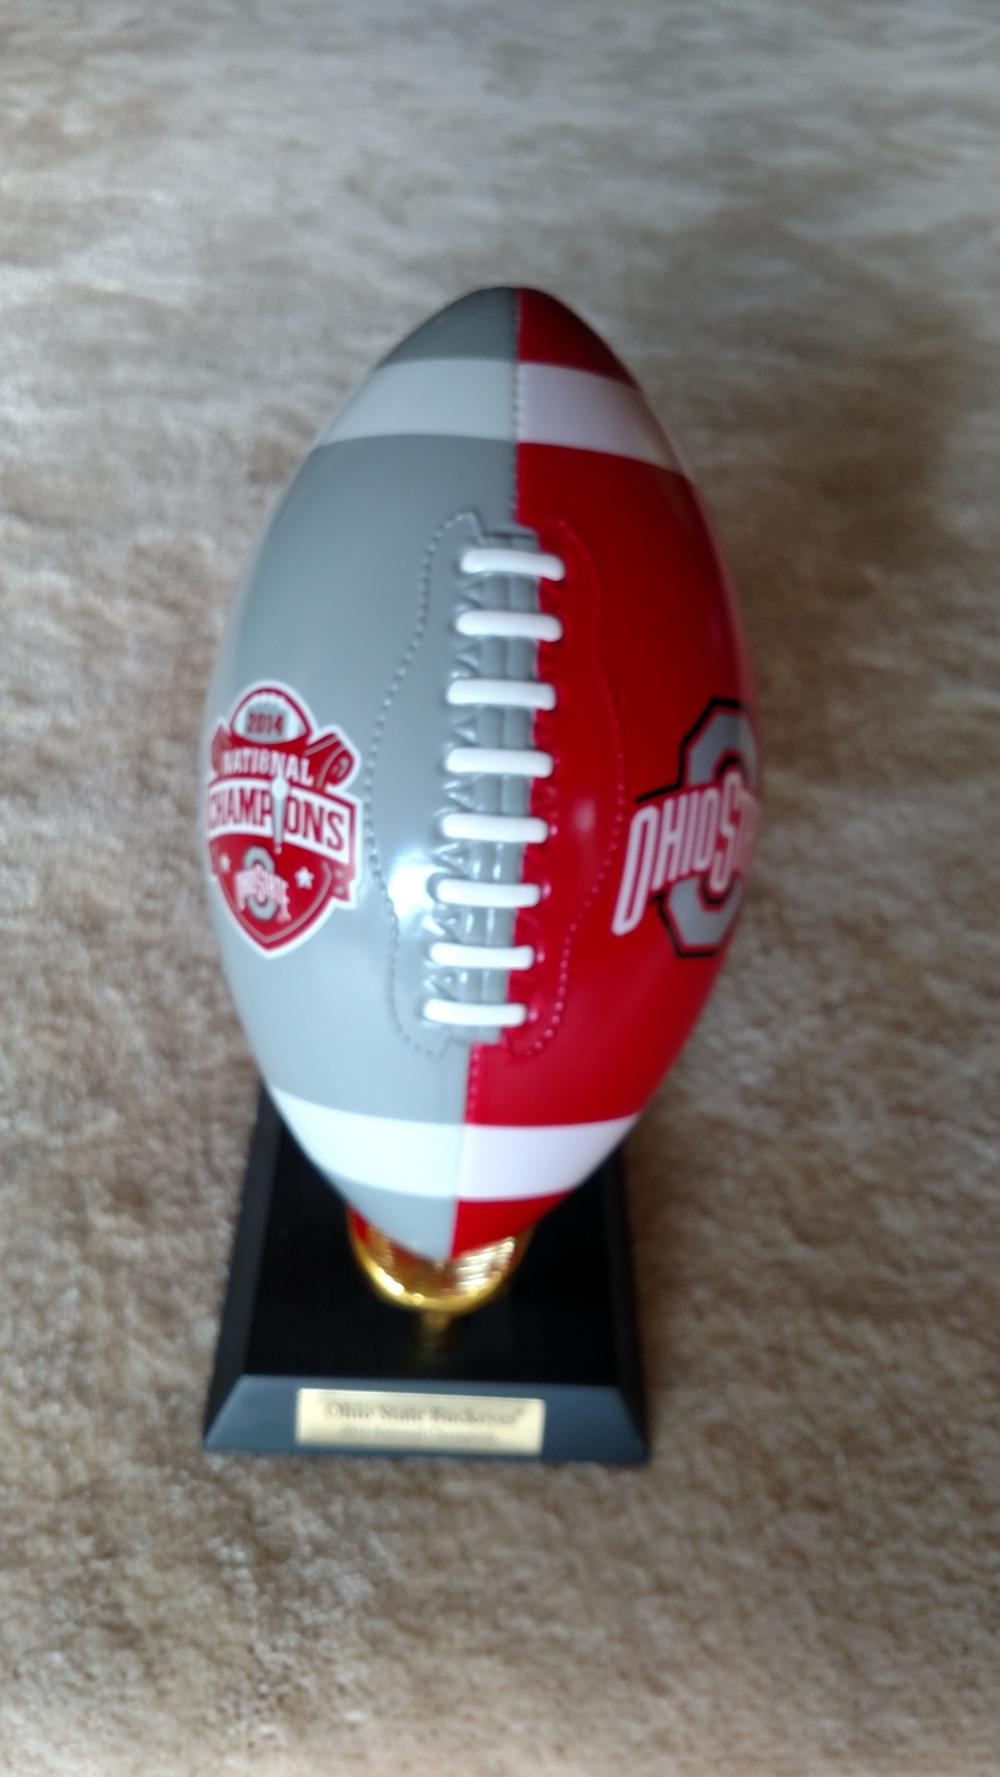 Ohio State Buckeyes 2014 National Championship commemorative ceramic football